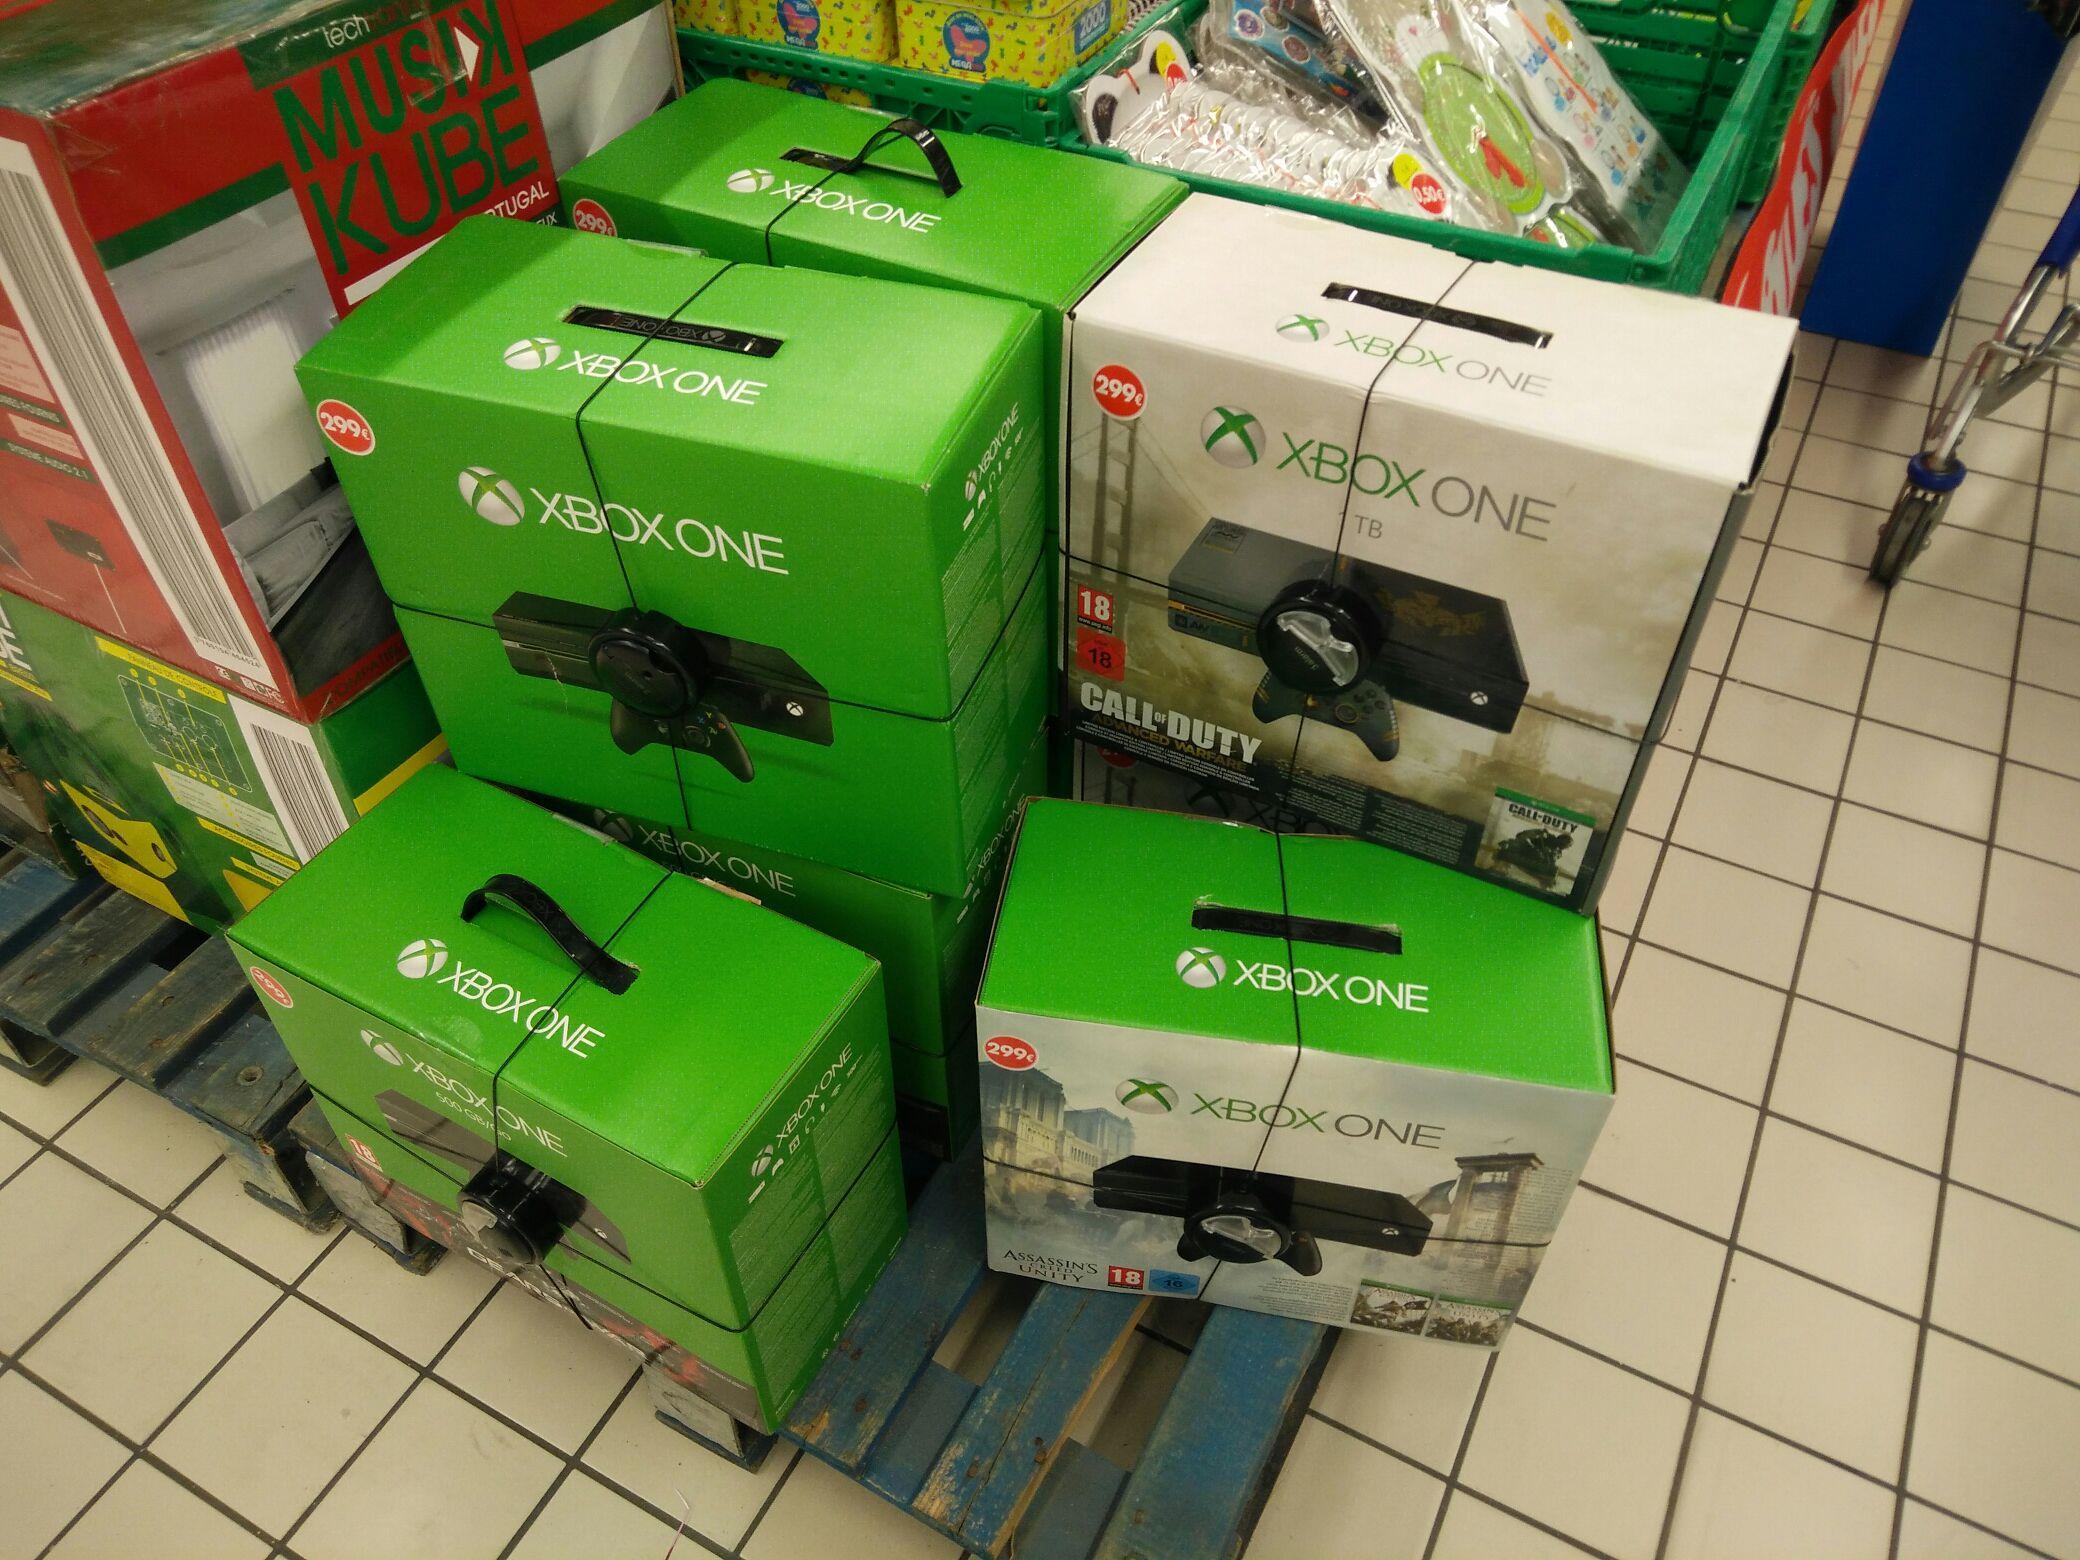 Sélection de packs Xbox One en promotion - Ex : Pack Call Of Duty Advance Warfare 1To